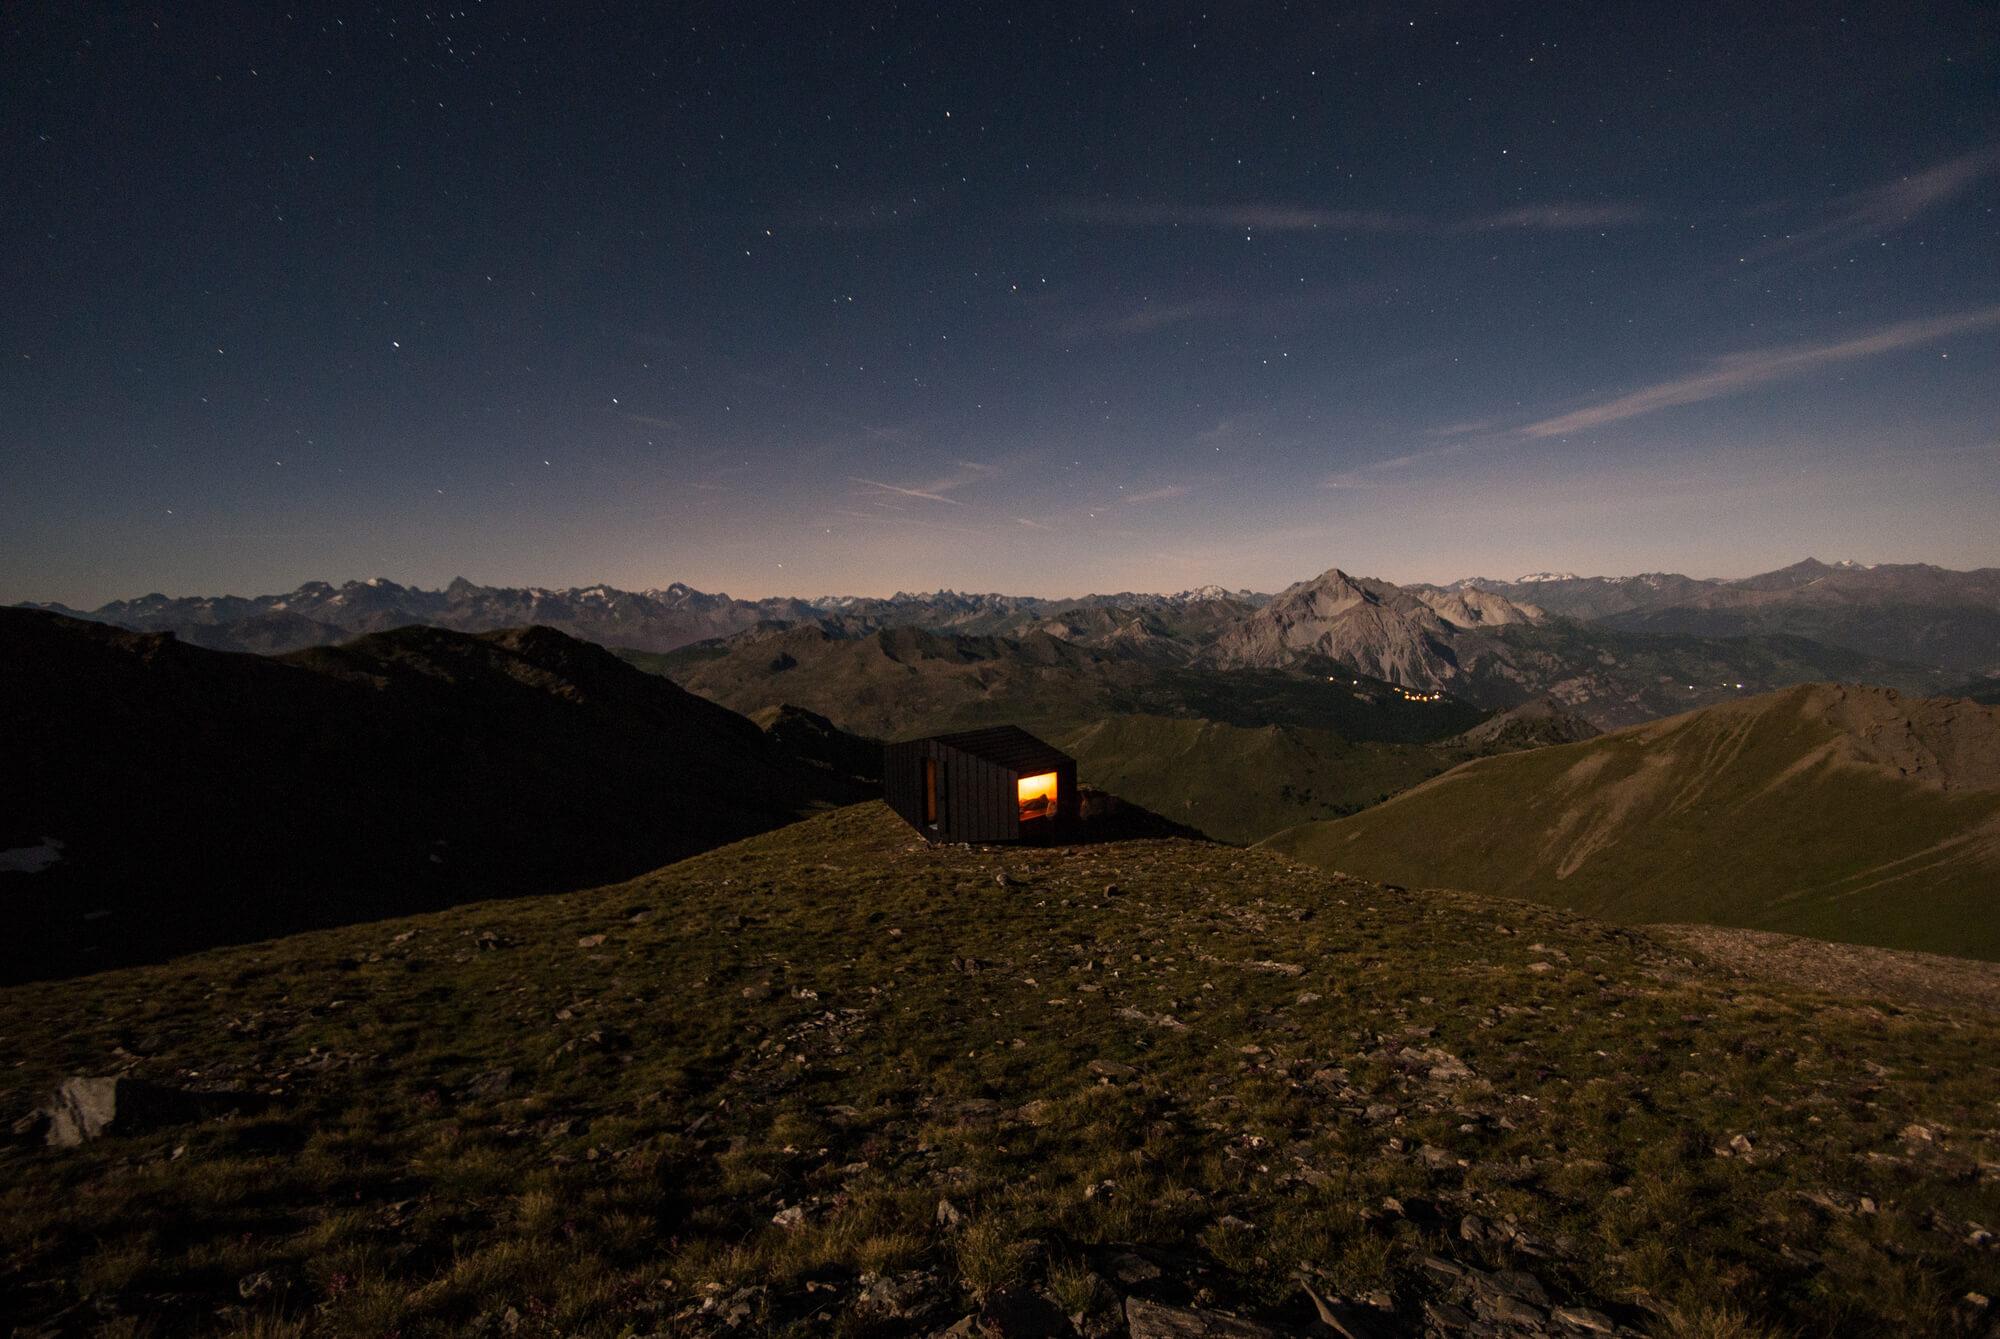 Black Body Mountain Shelter by Michele Versaci